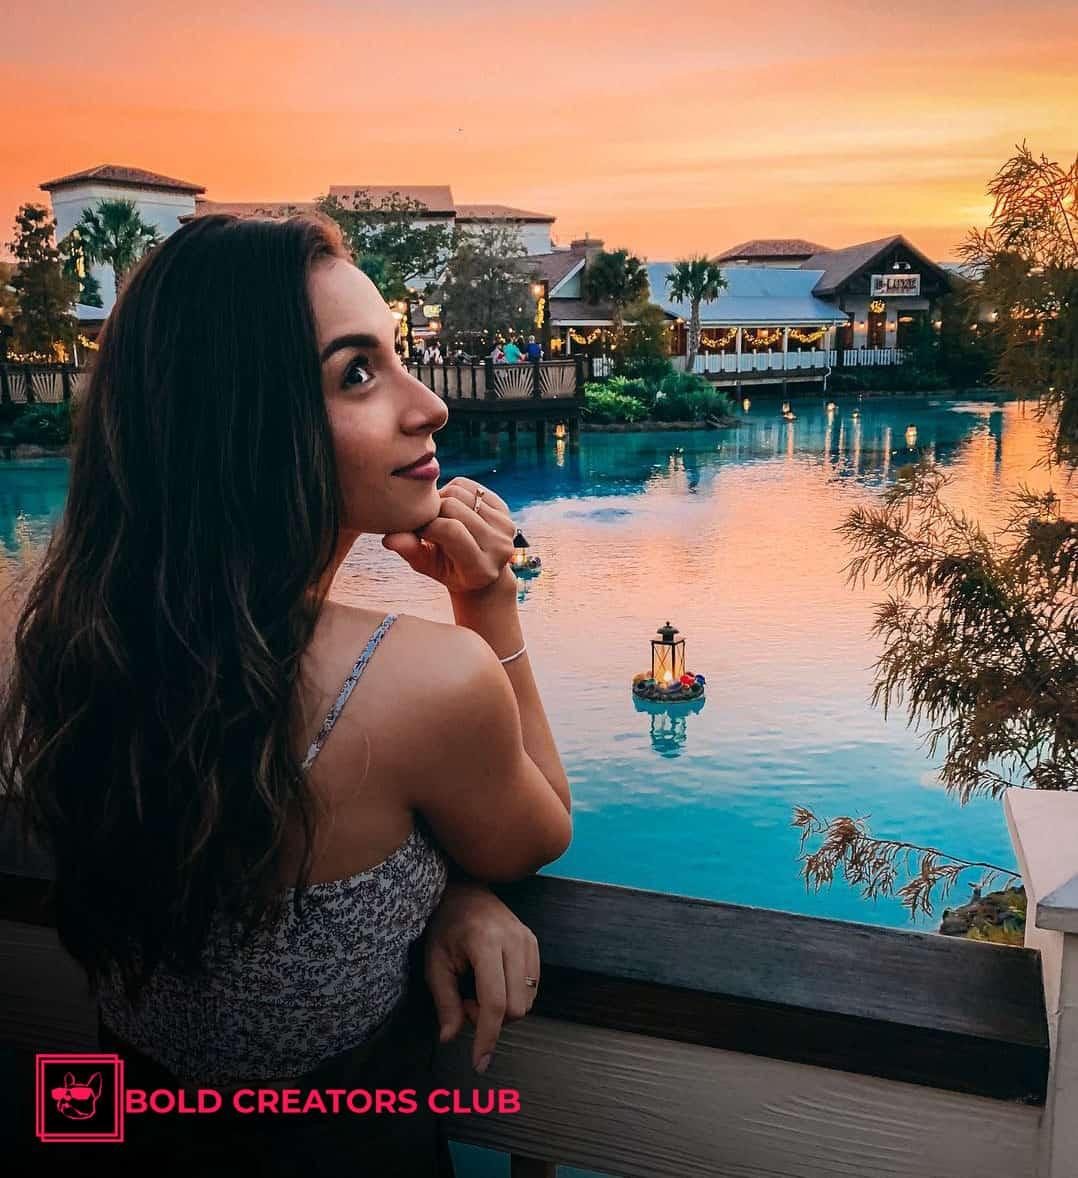 Nicolle Rocha Bold Creators Club Influencer Marketing Agency South America Brazil